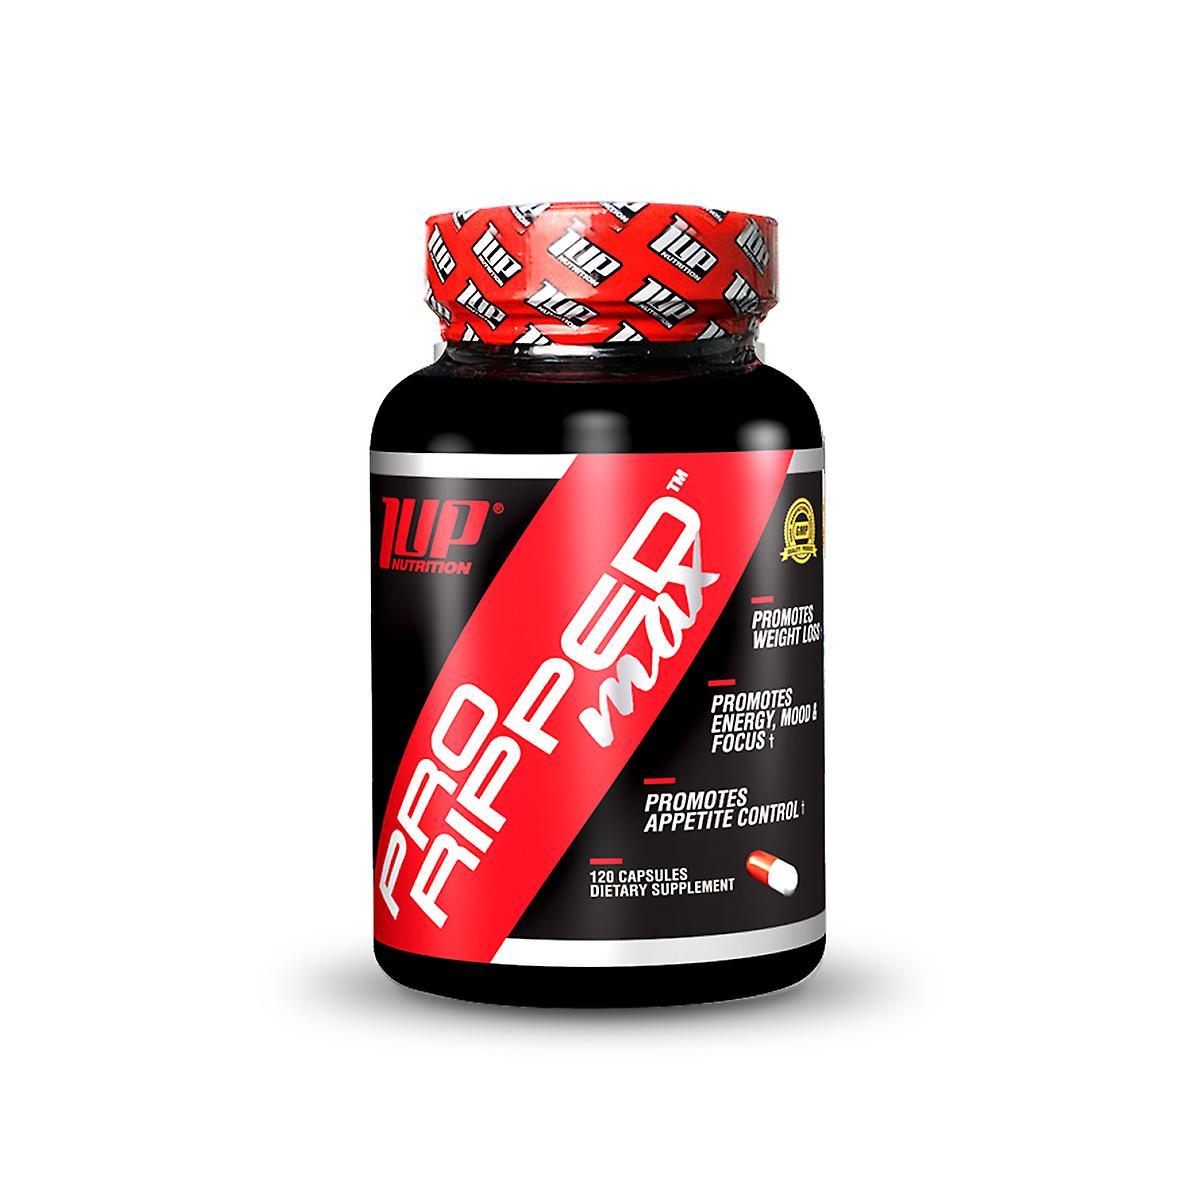 1 up Nutrition Pro Ripped Max, perda de peso, suplemento de energia